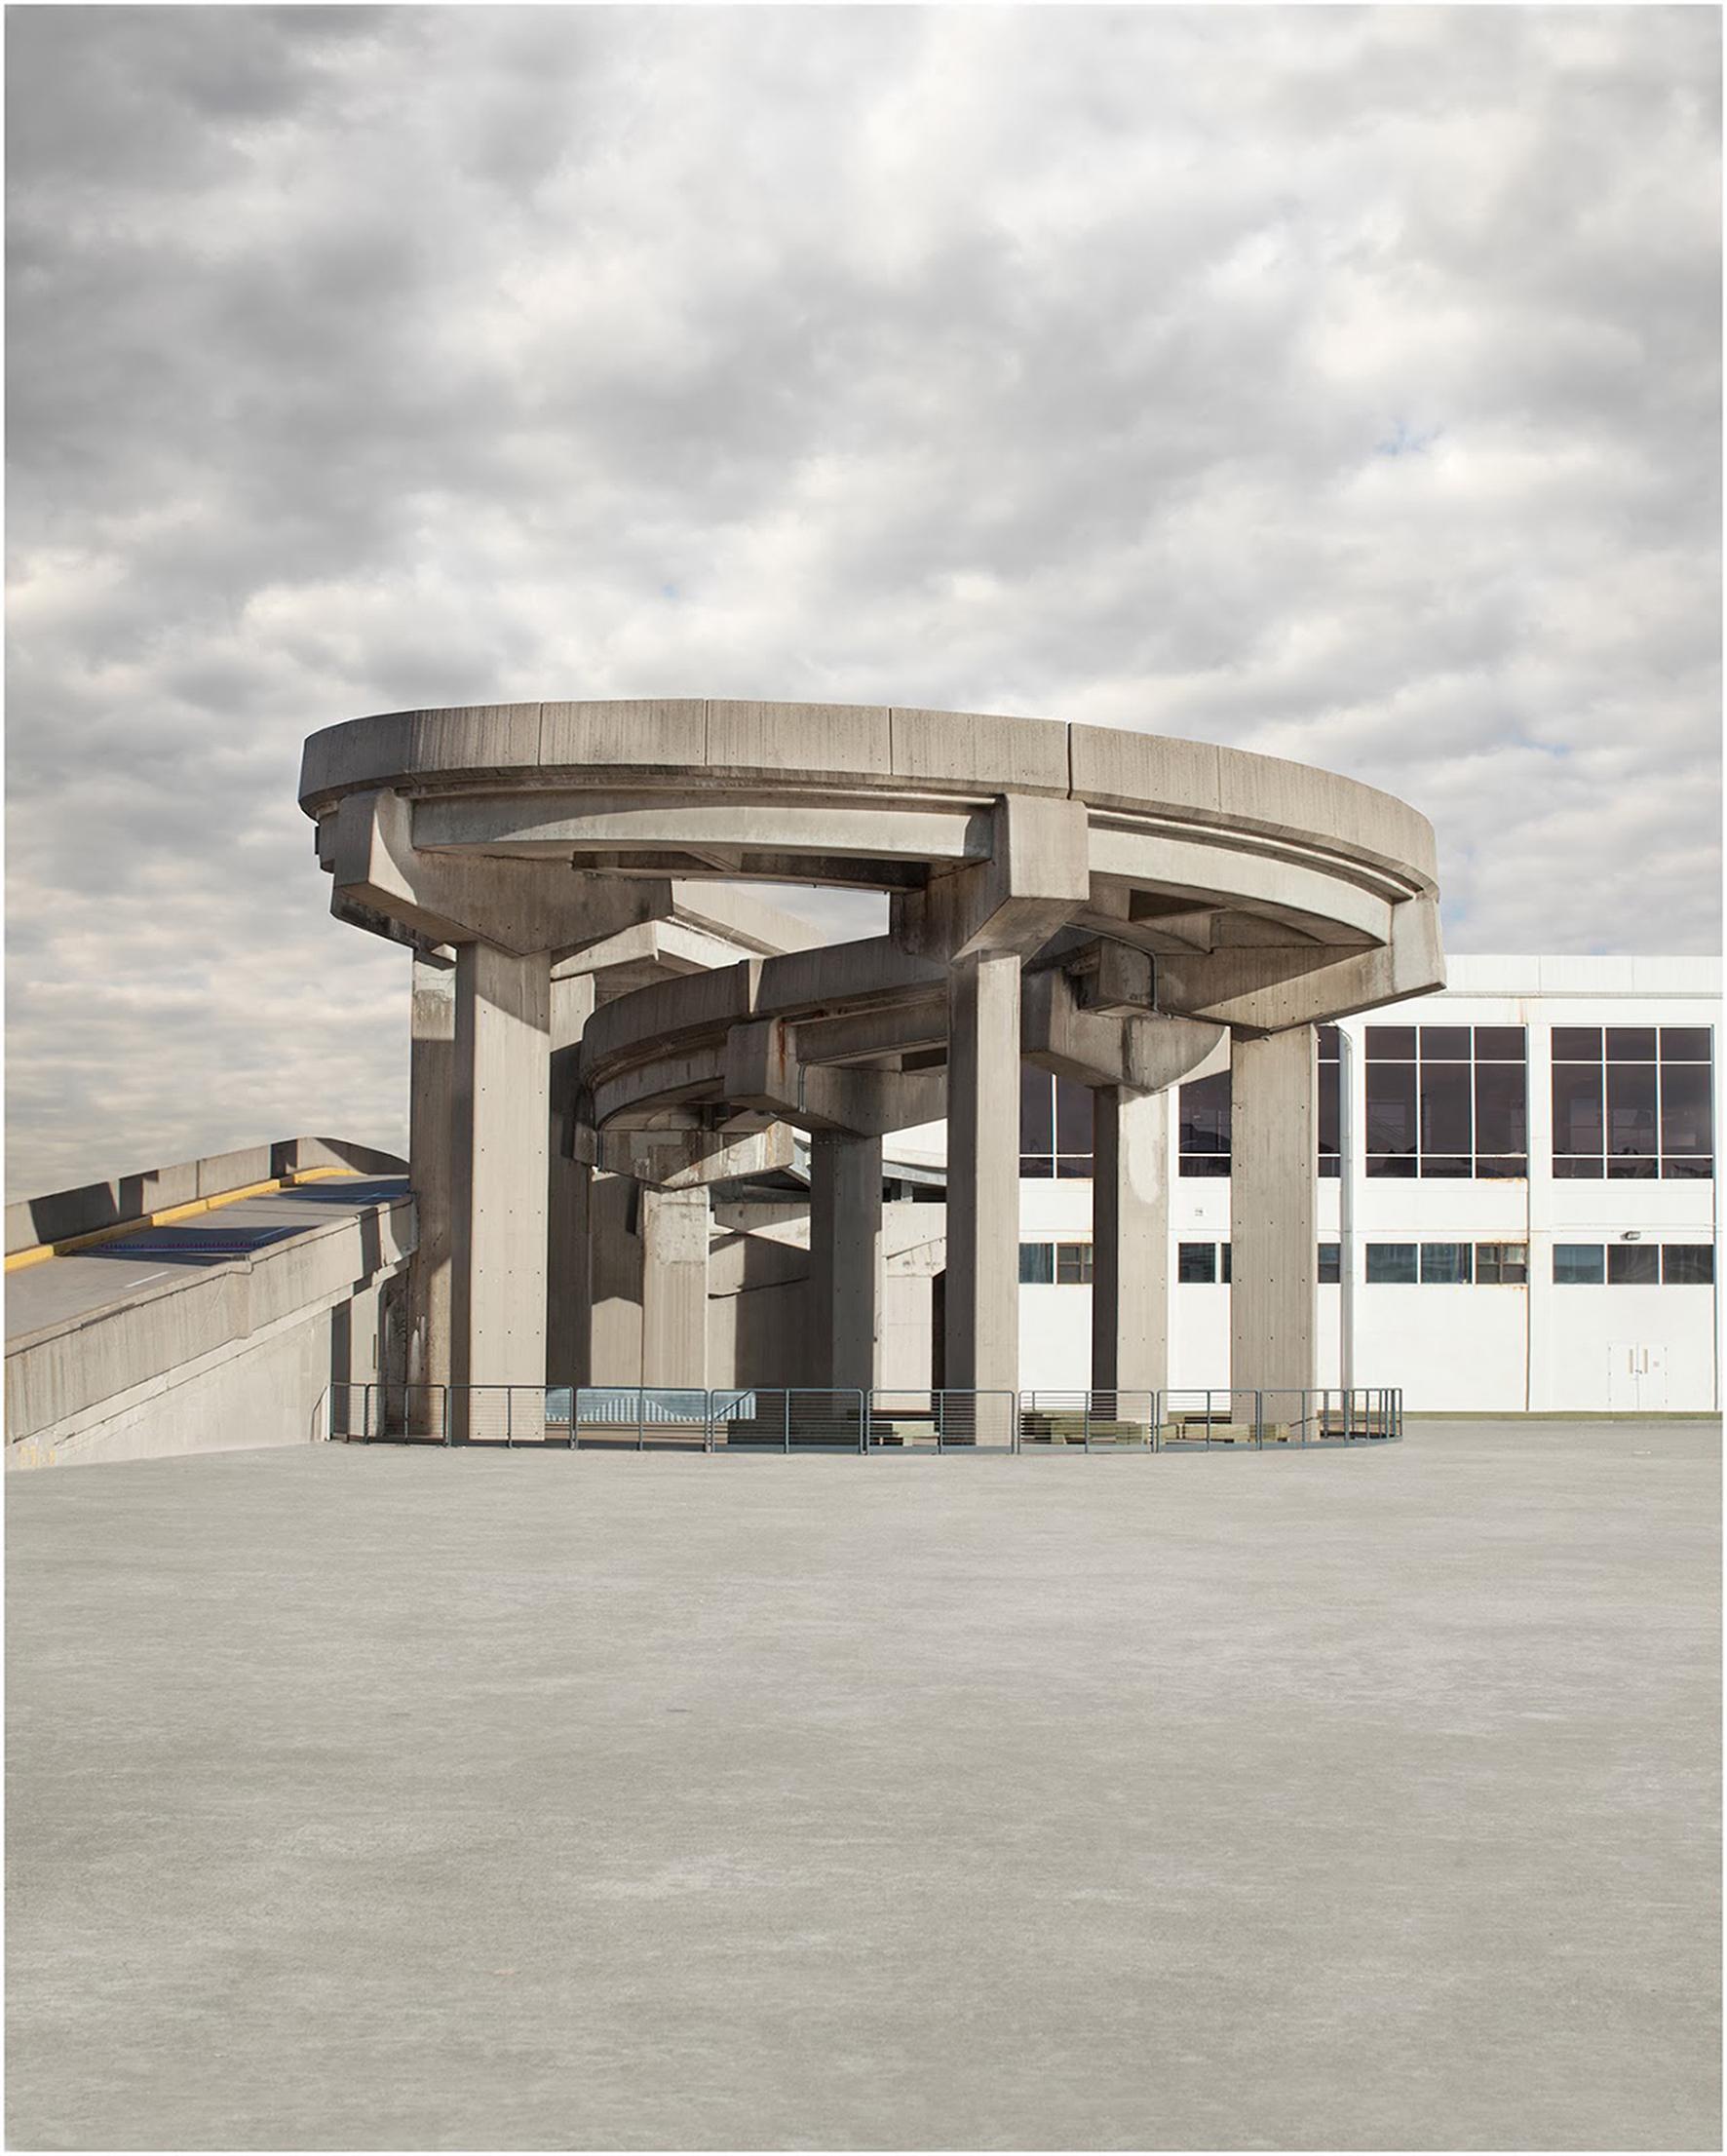 David Manley, Spiral Cement Structure, 2014